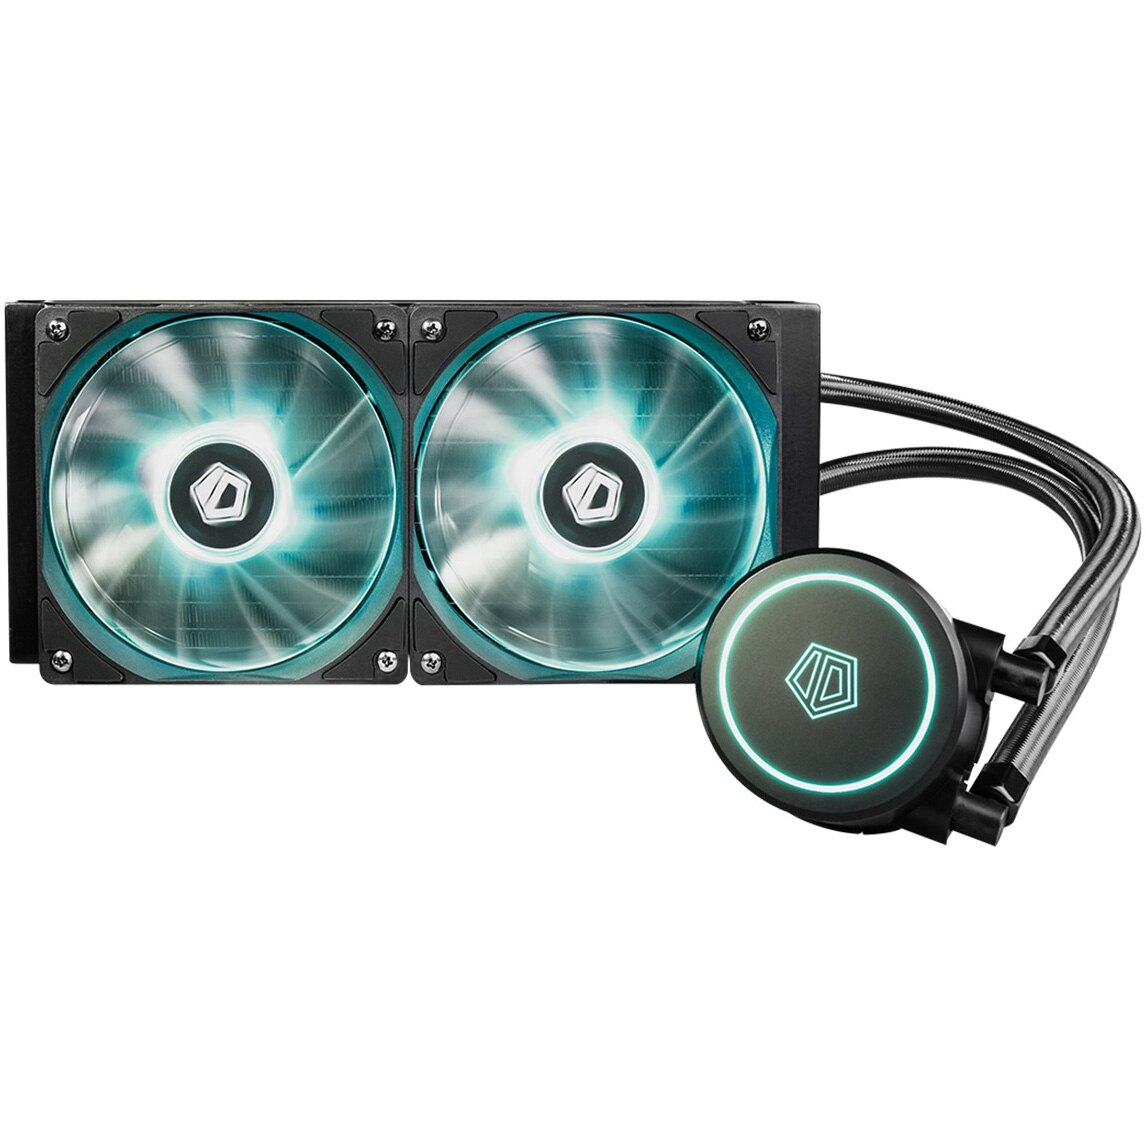 Fotografie Cooler procesor ID-Cooling Auraflow X 240, compatibil AMD/Intel